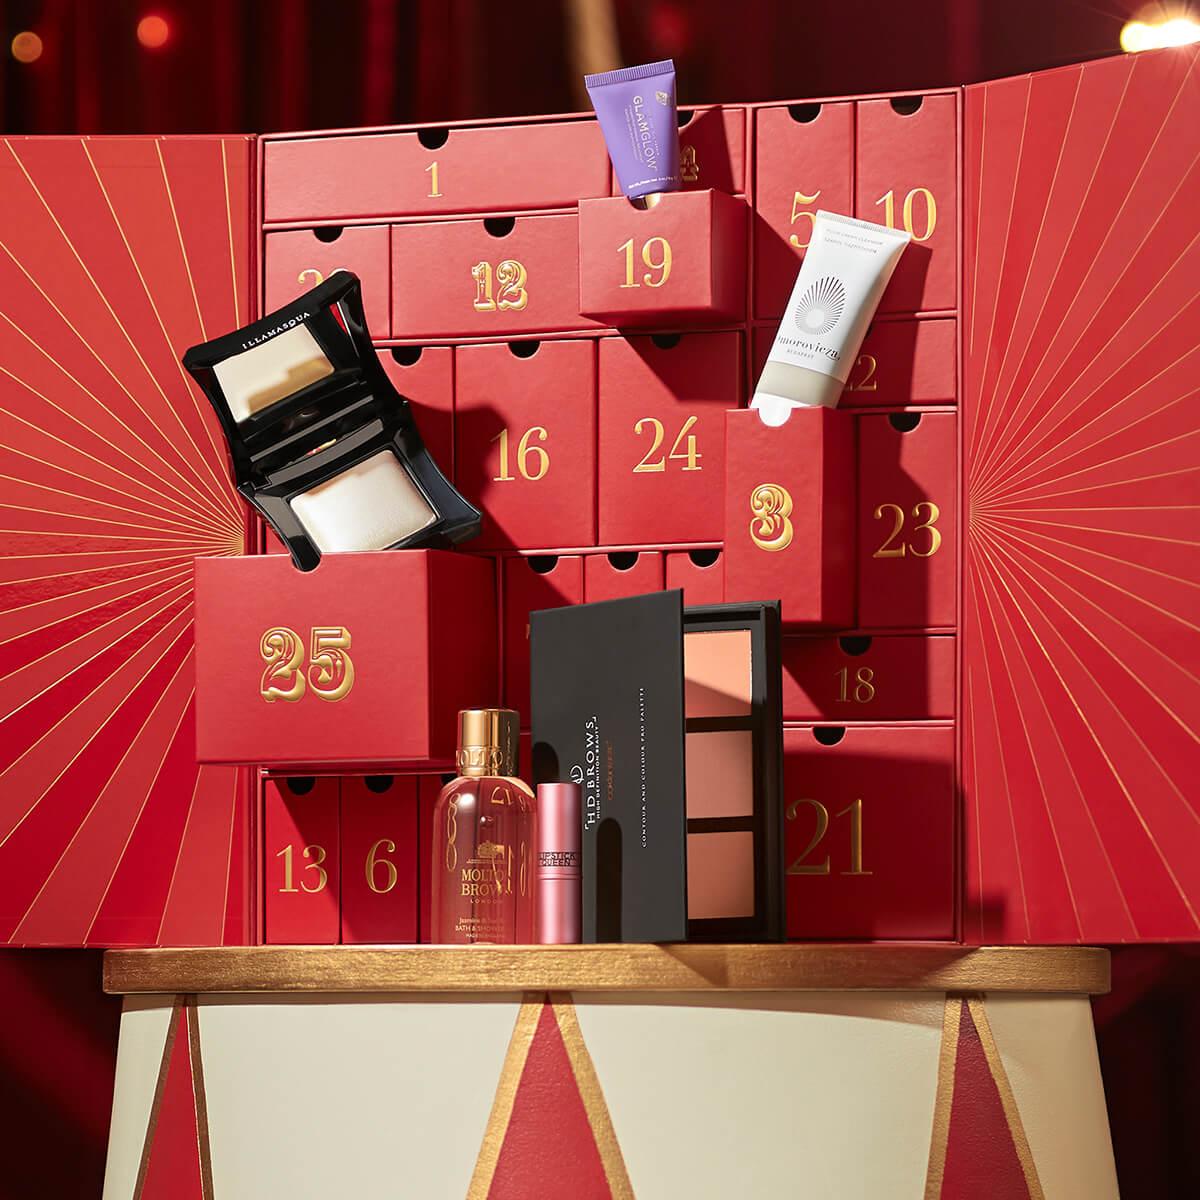 20% Off Look Fantastic Beauty Advent Calendar - £63.20 (with code) @ Look Fantastic